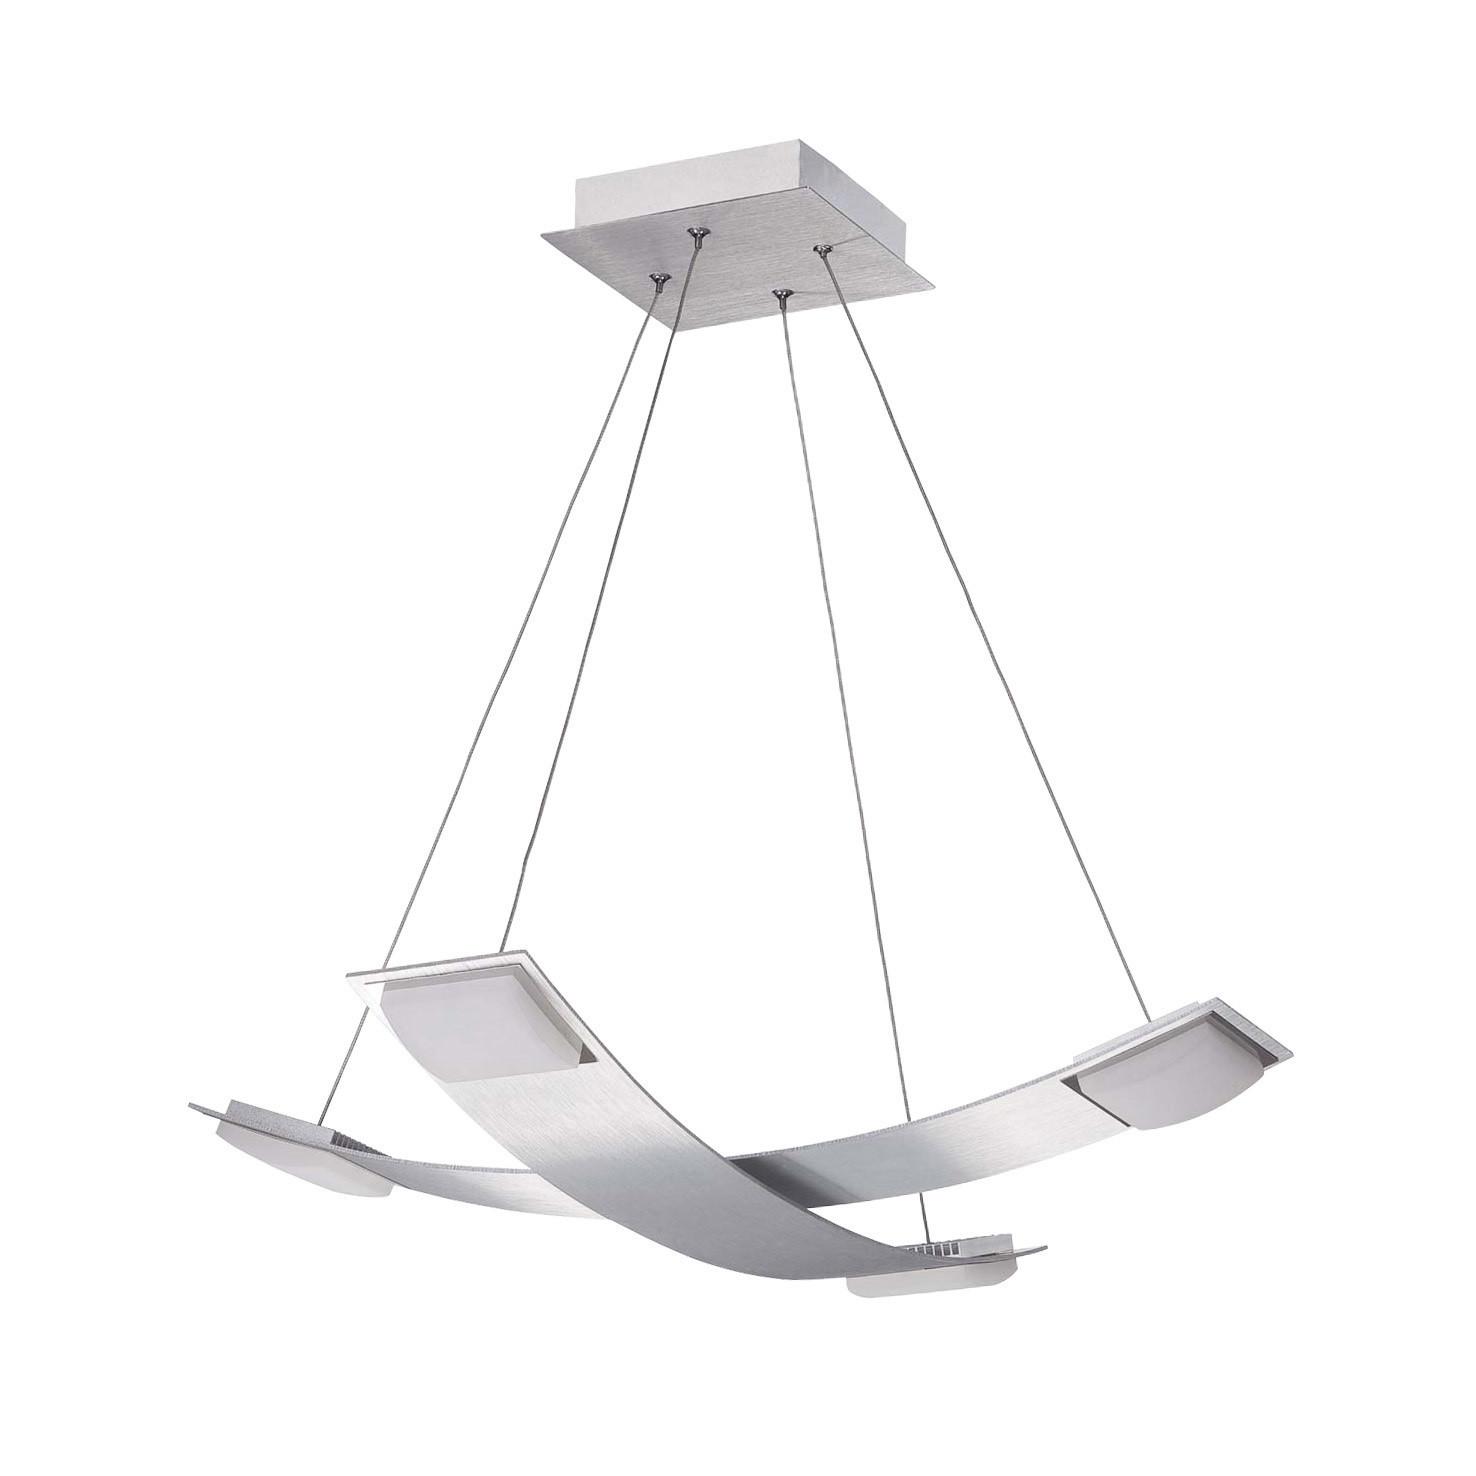 Thea Pendant 4 Light 28W LED 3000K, 2520lm, Satin Aluminium/Frosted Acrylic, 3yrs Warranty